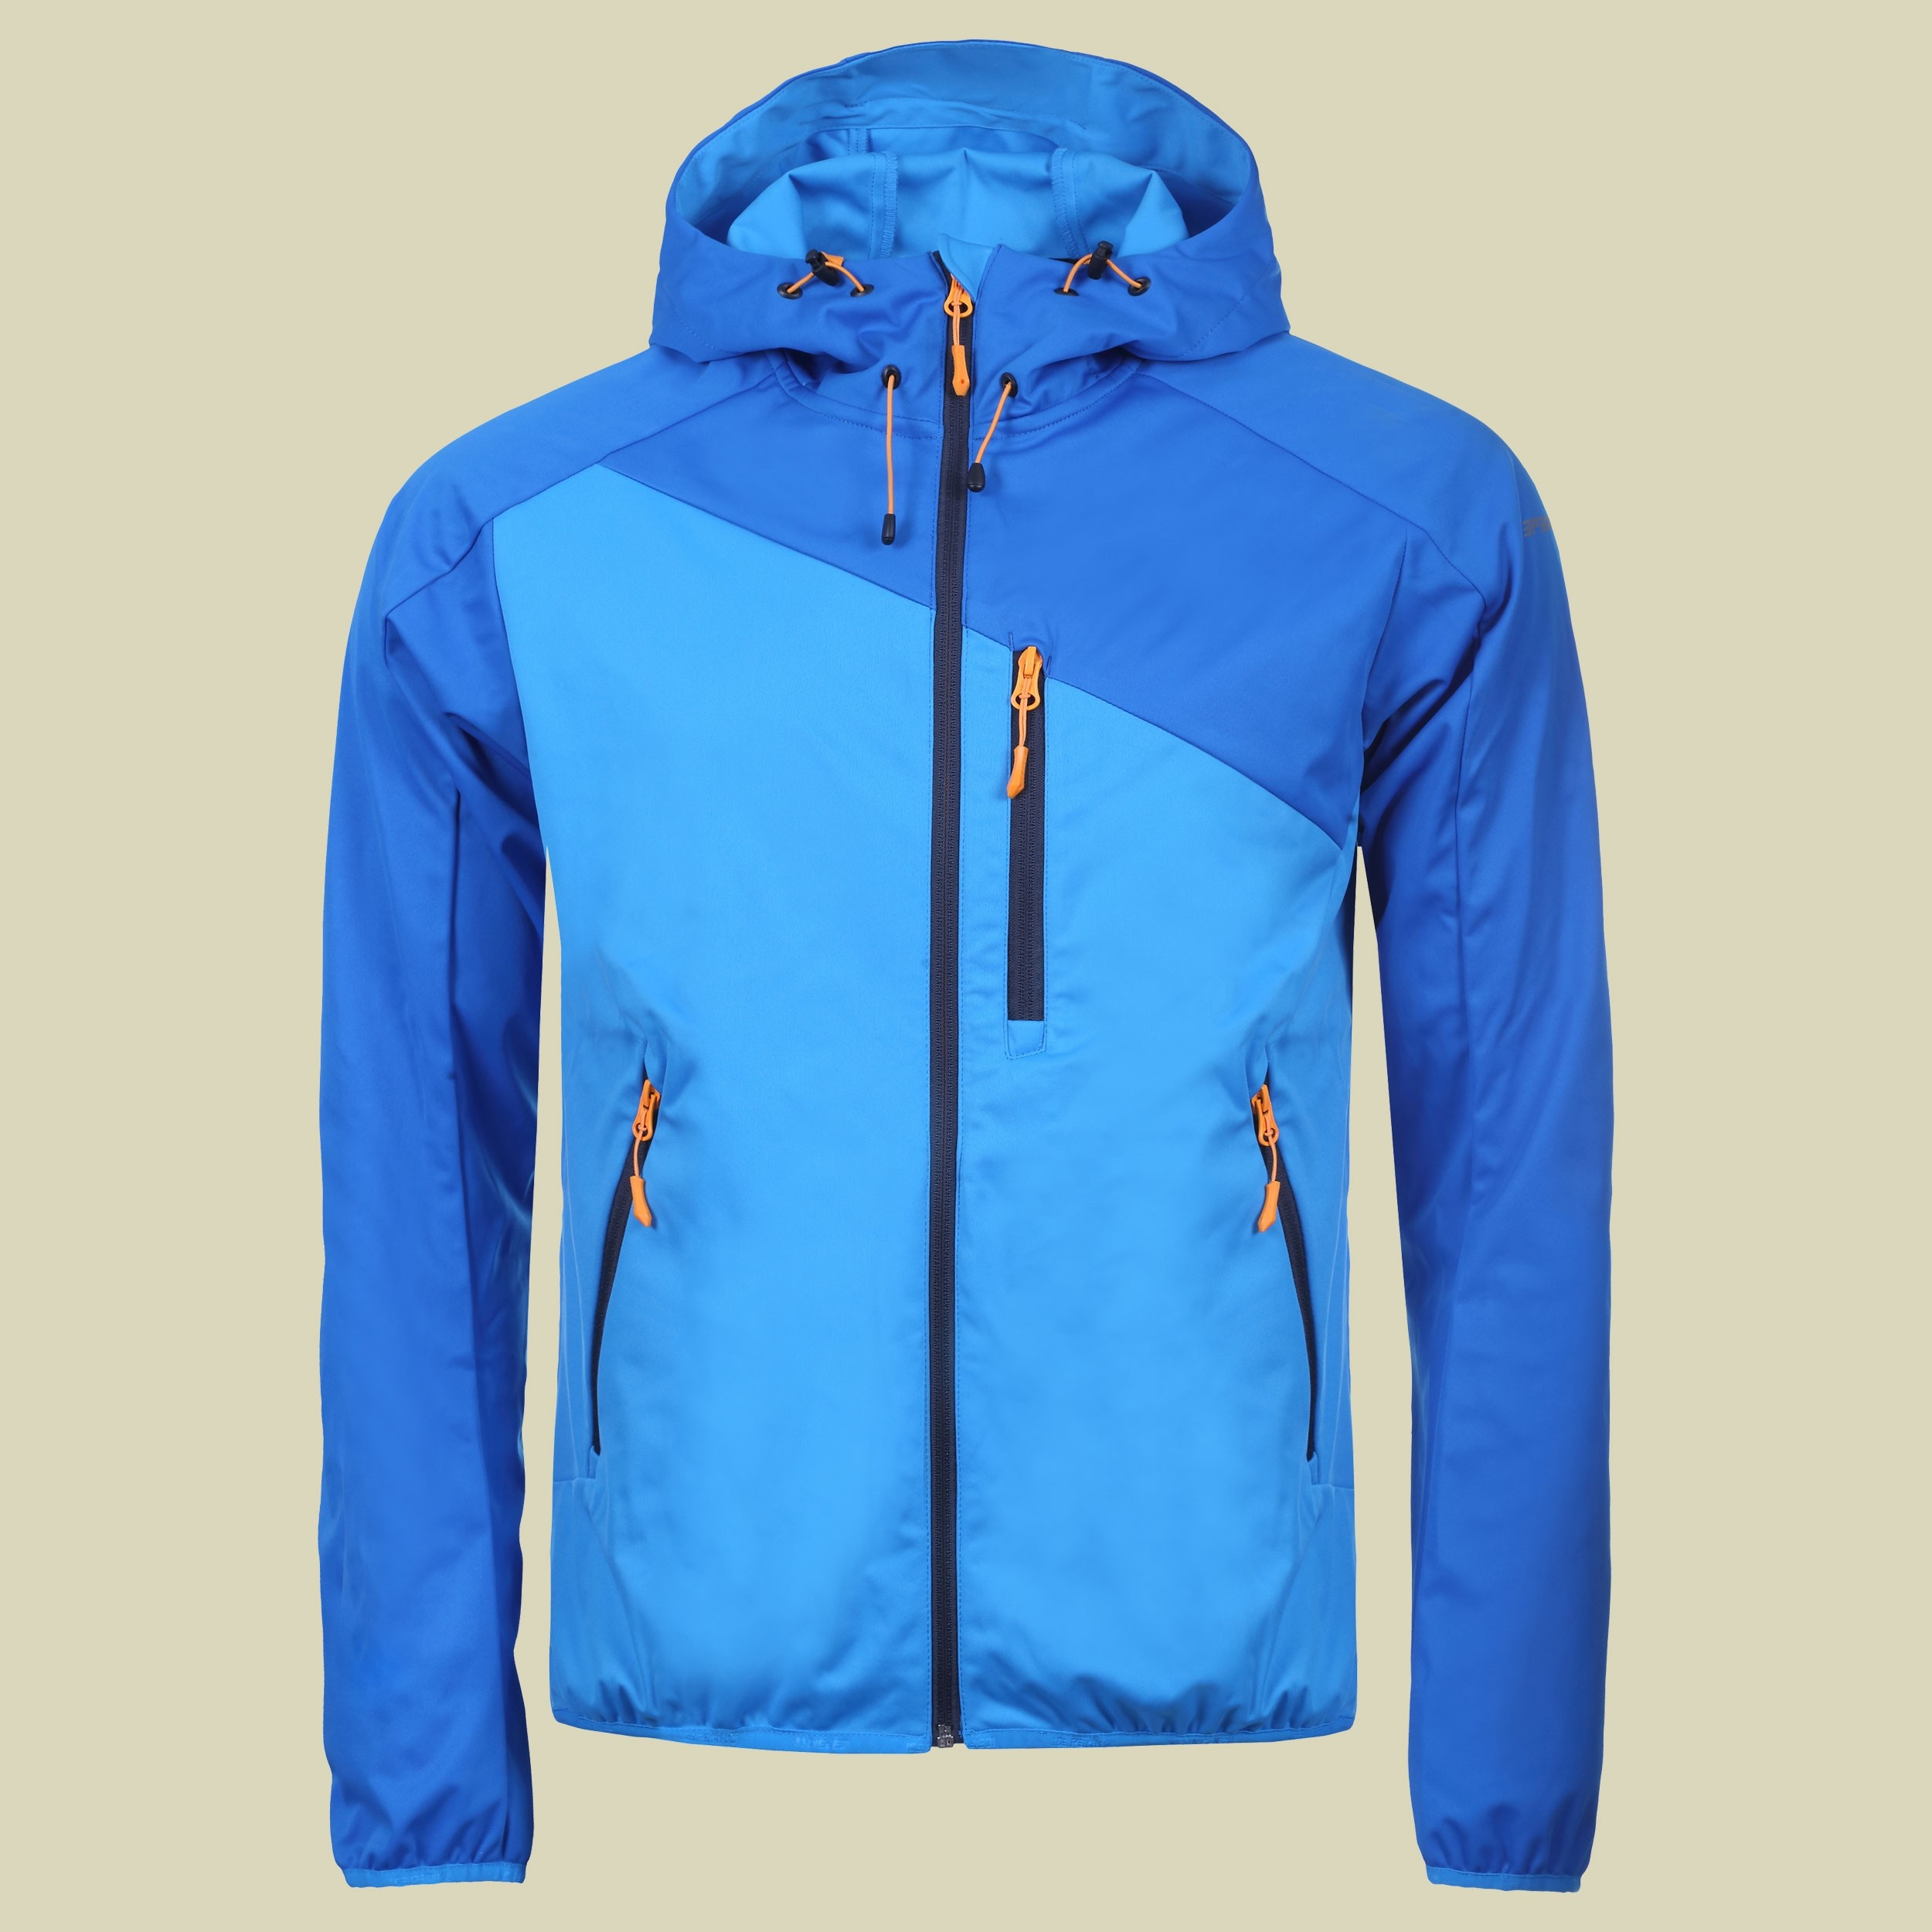 e2659508e2 Icepeak Silvain Softshell Jacket Men 57922 505 - Herren ...